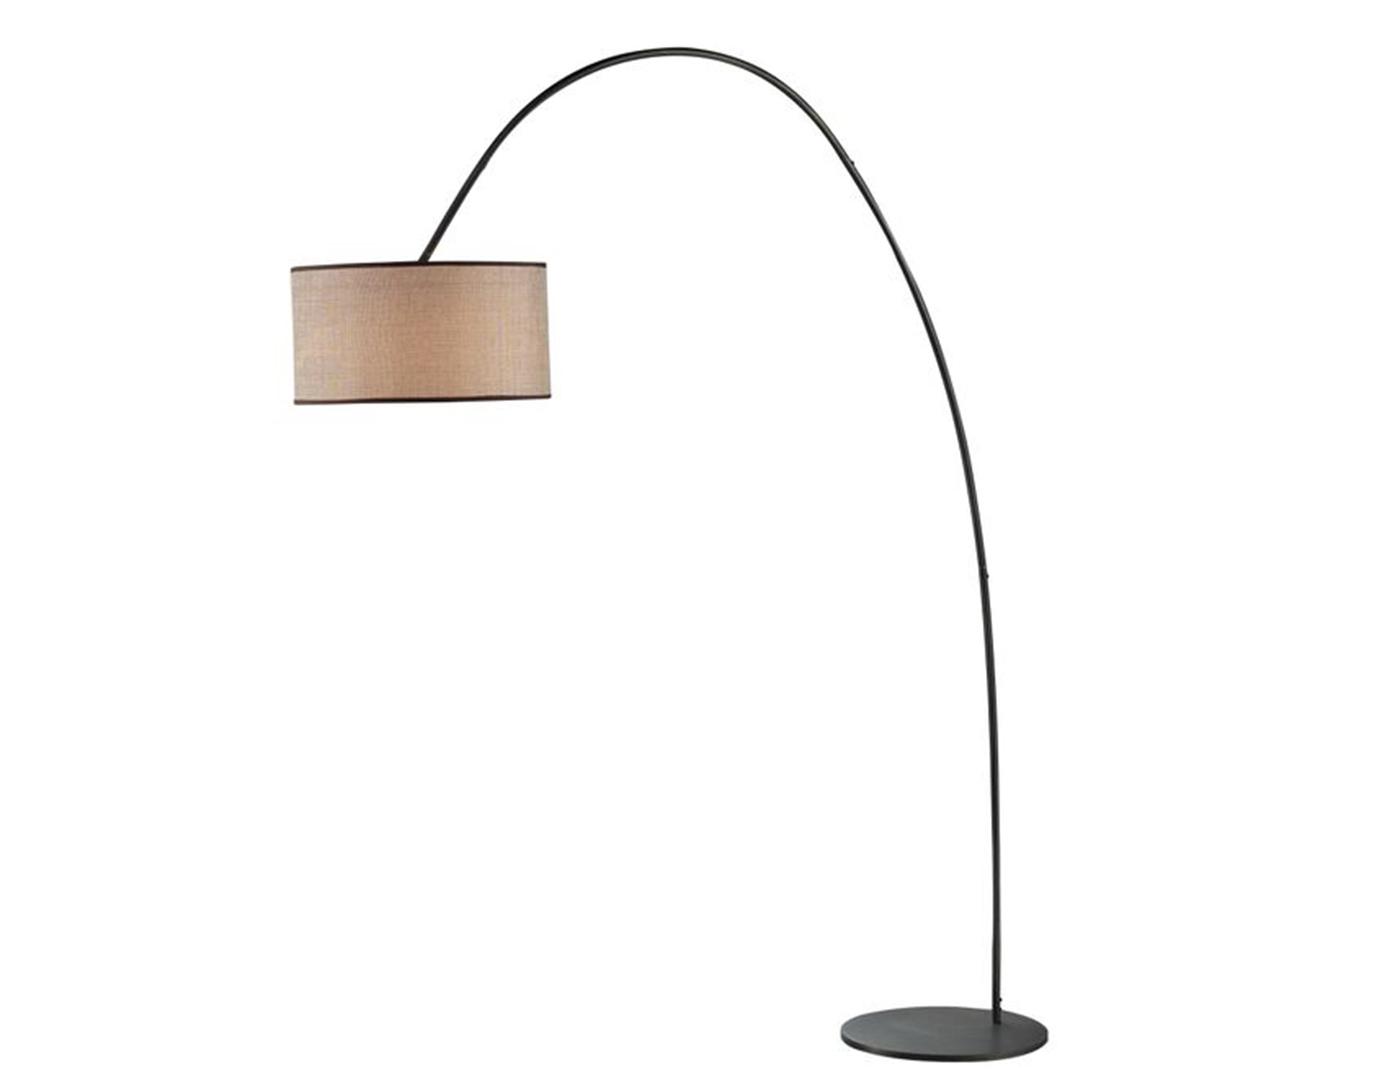 steinhafels bronze arc floor lamp. Black Bedroom Furniture Sets. Home Design Ideas